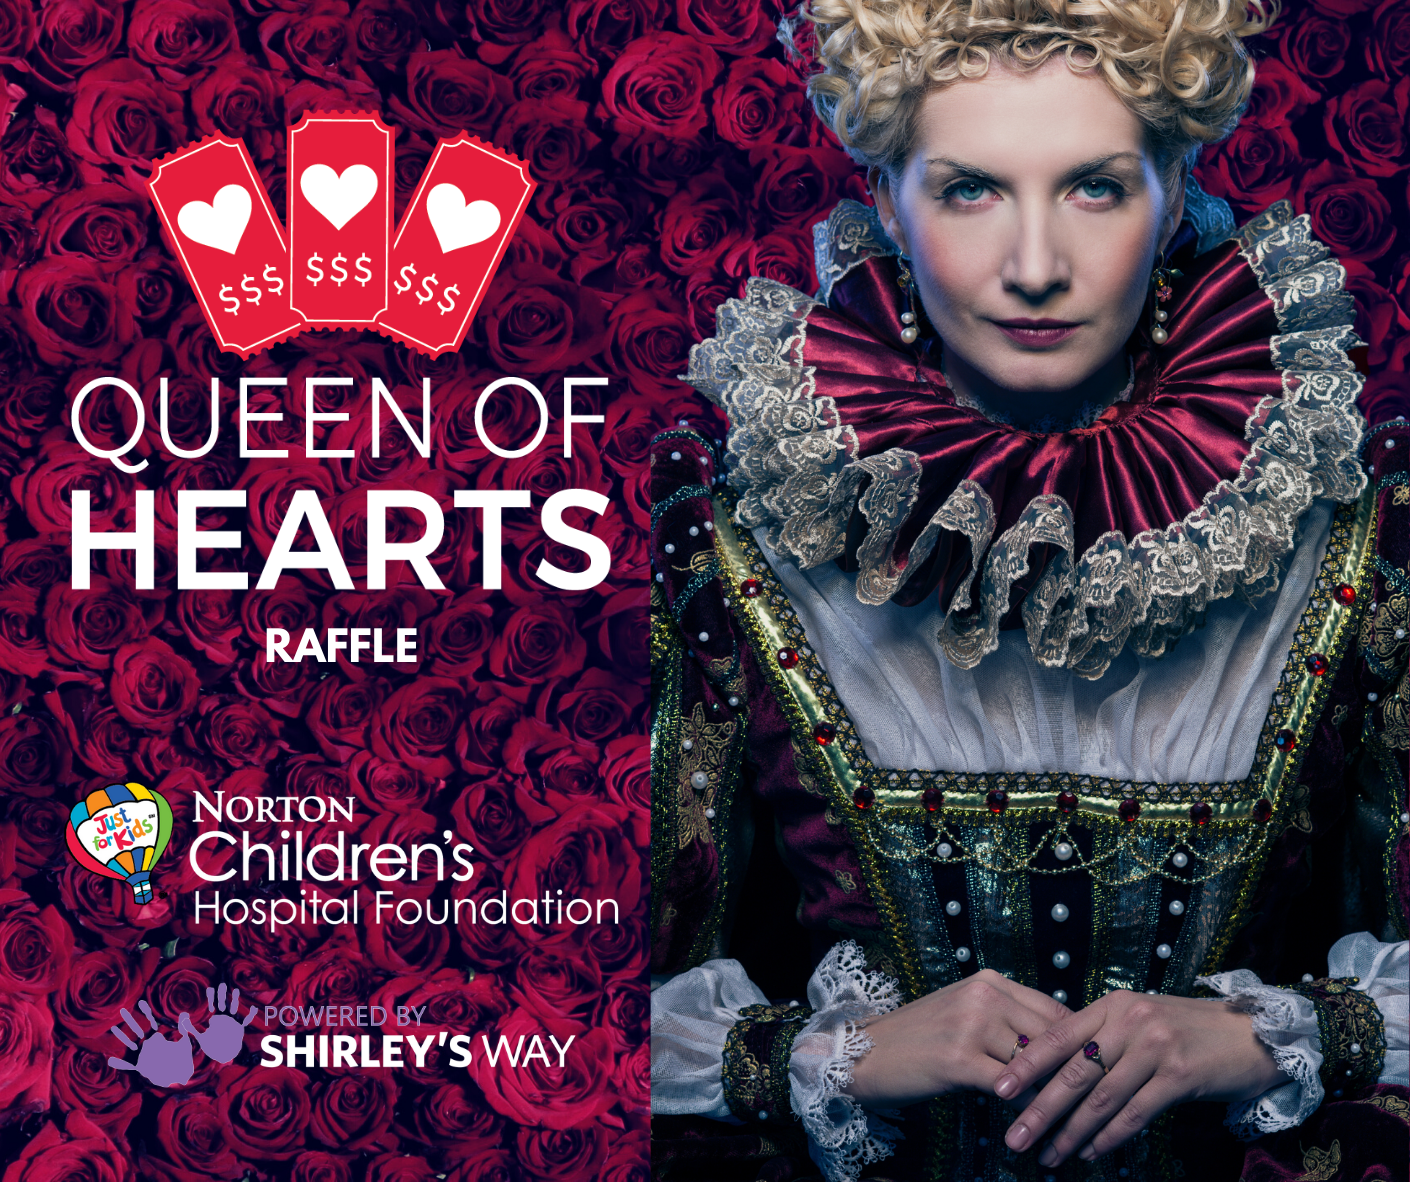 Queen of Hearts Weekly Drawings